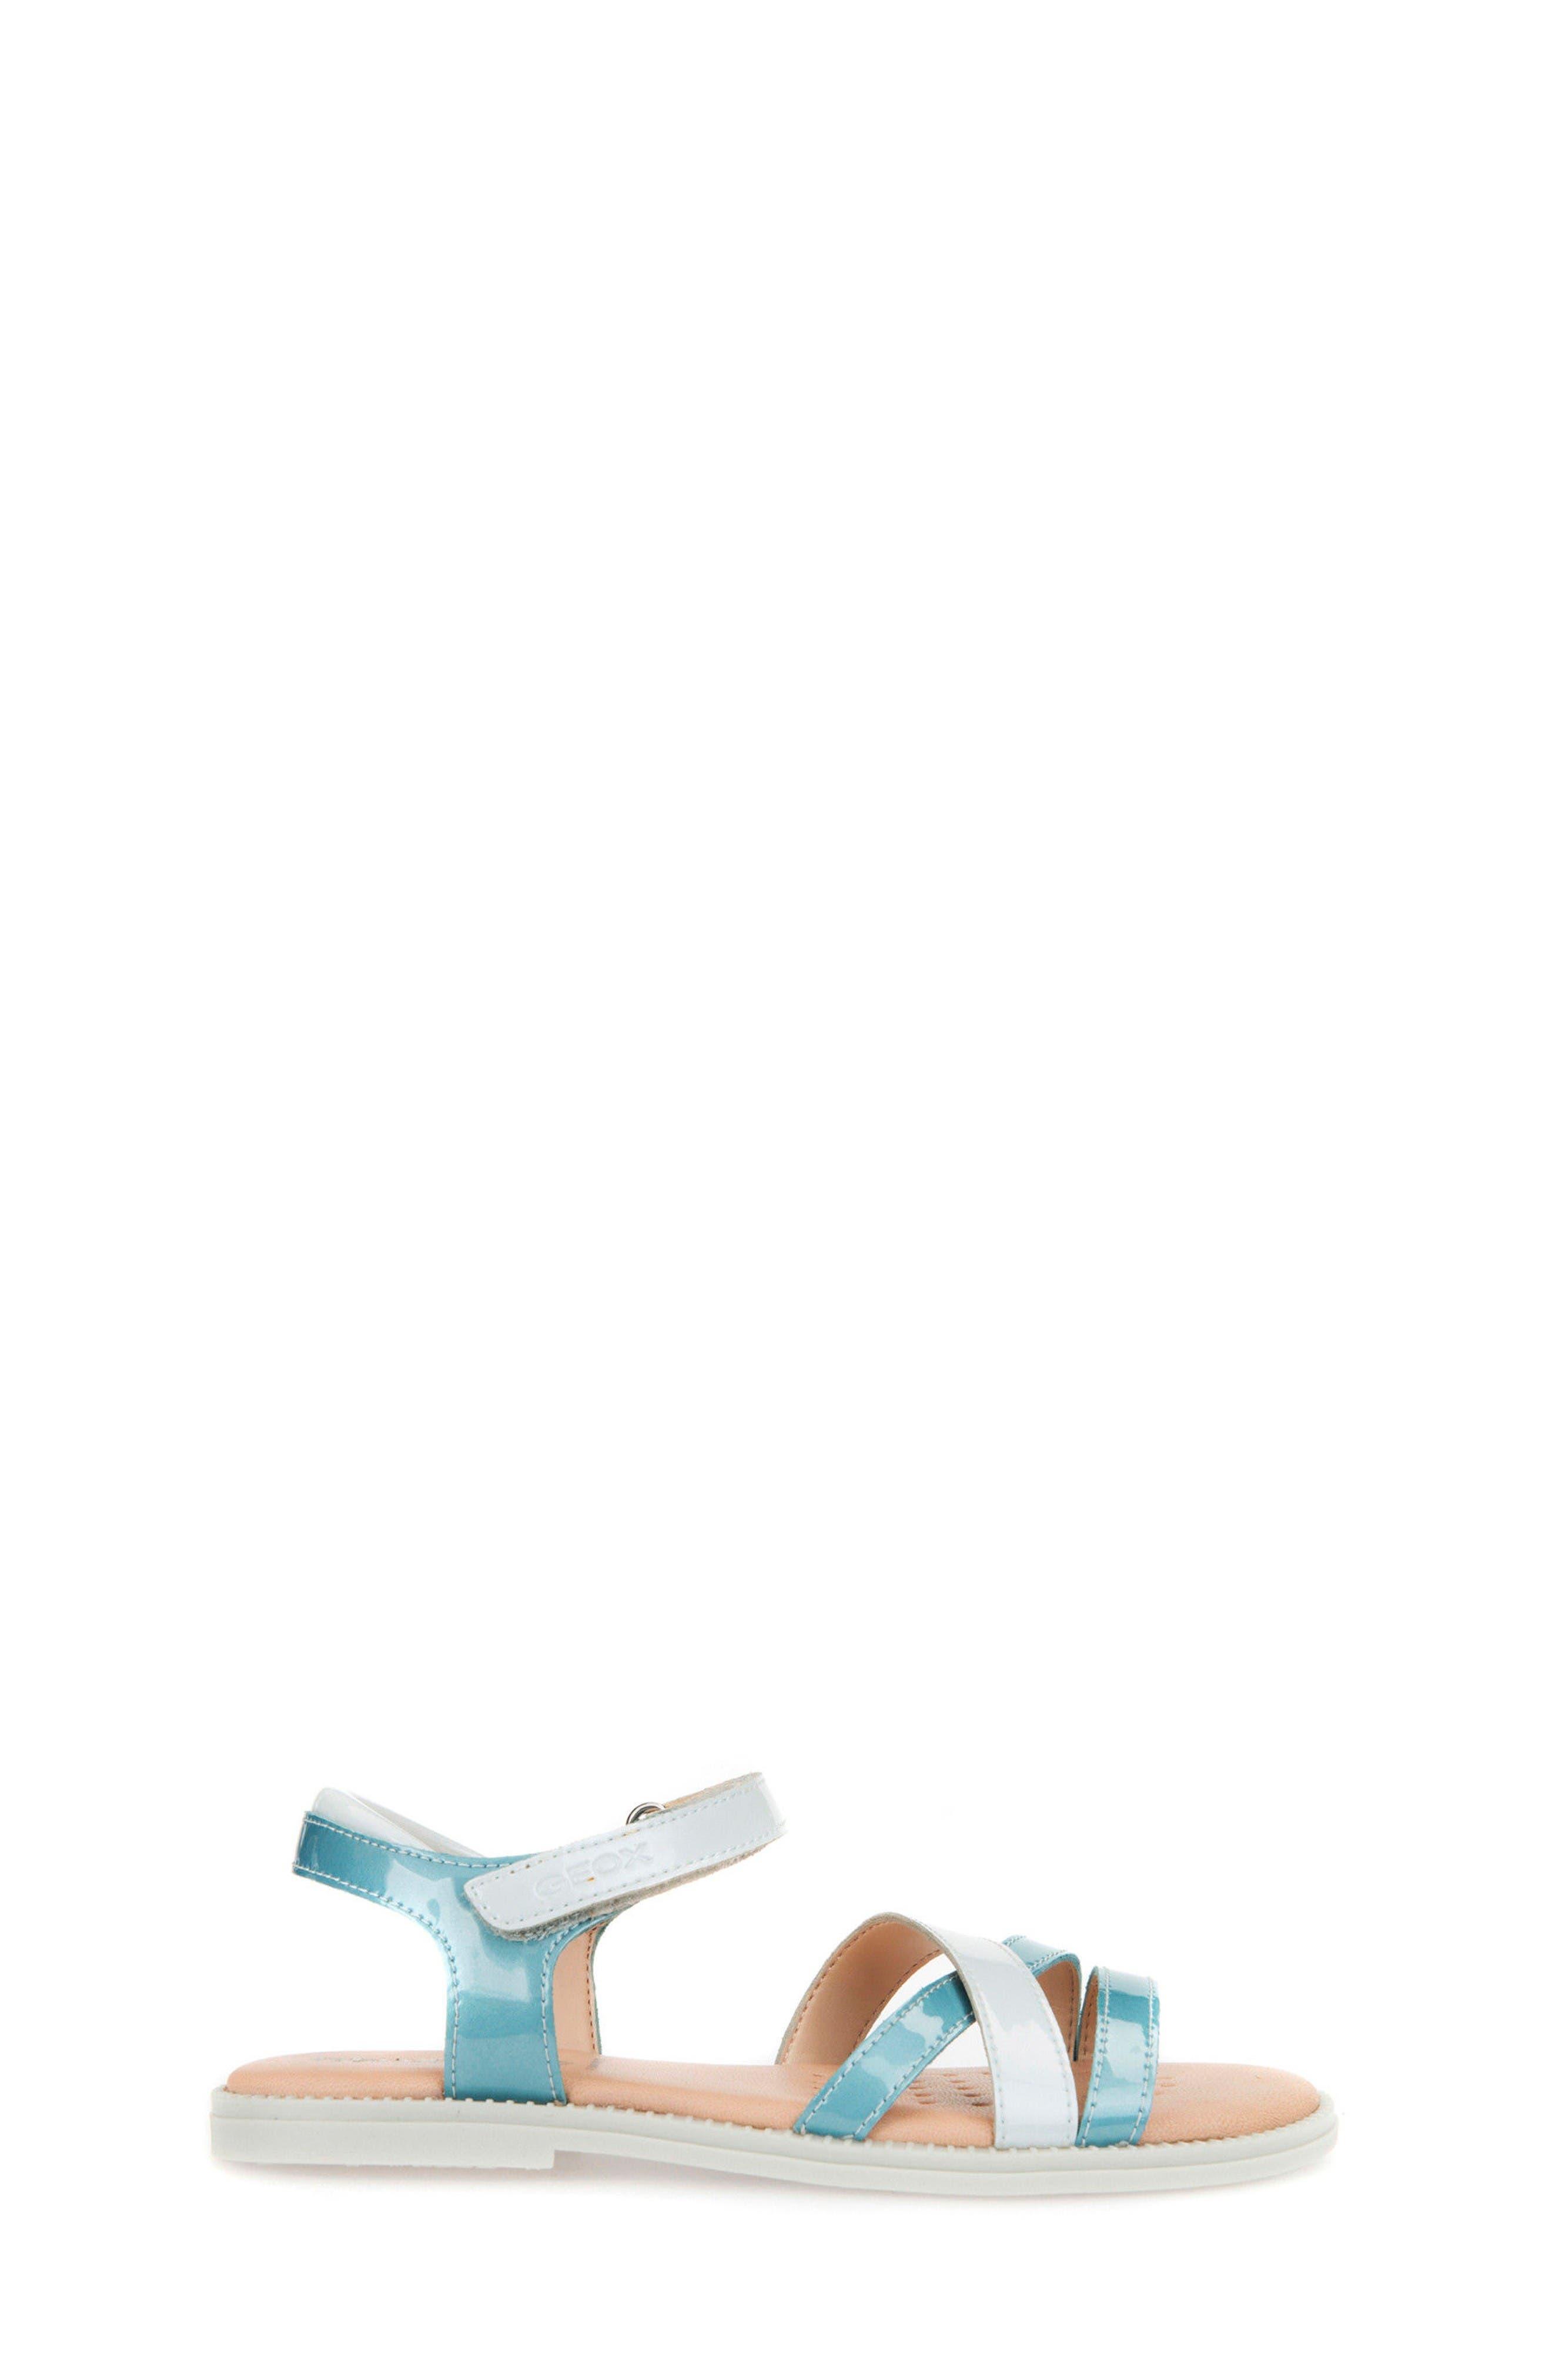 Alternate Image 3  - Geox Karly Girl Sandal (Toddler, Little Kid & Big Kid)